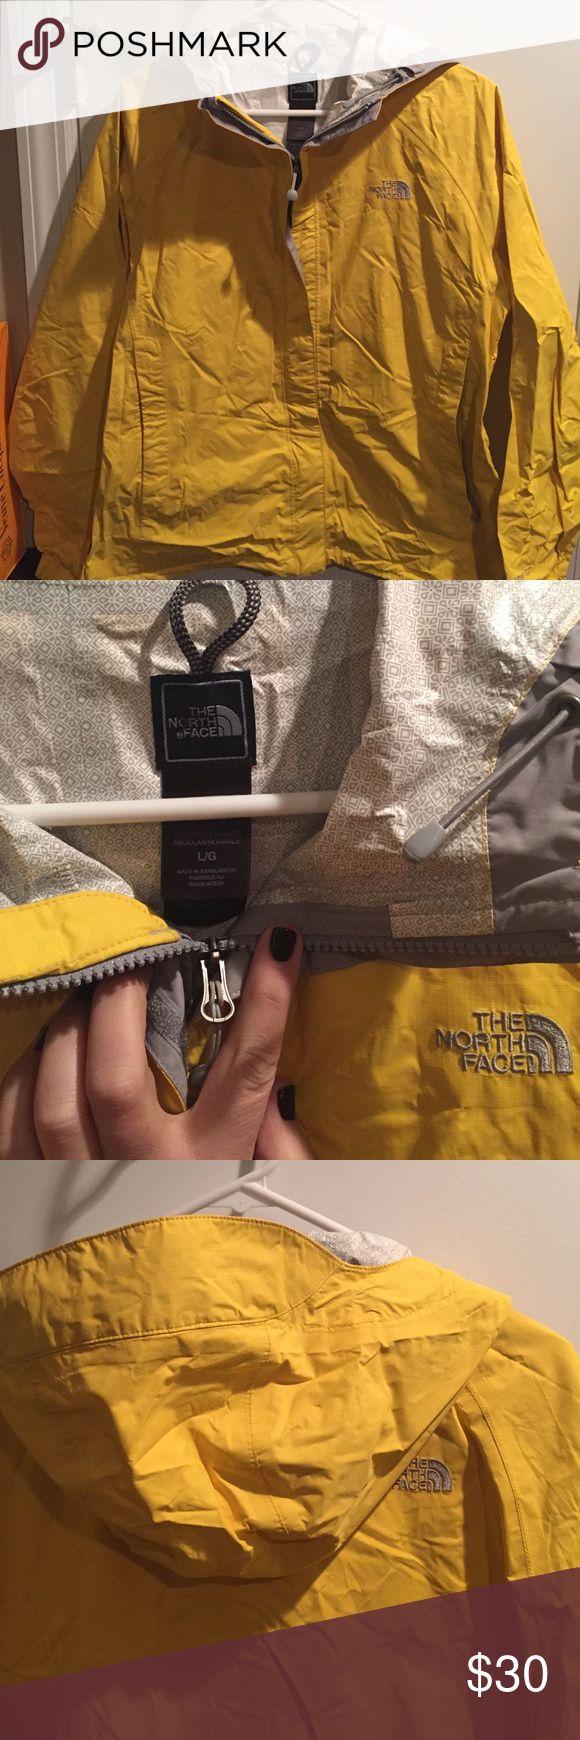 North Face rain jacket Bright yellow women's rain coat. Size large. Like new! The North Face Jackets & Coats